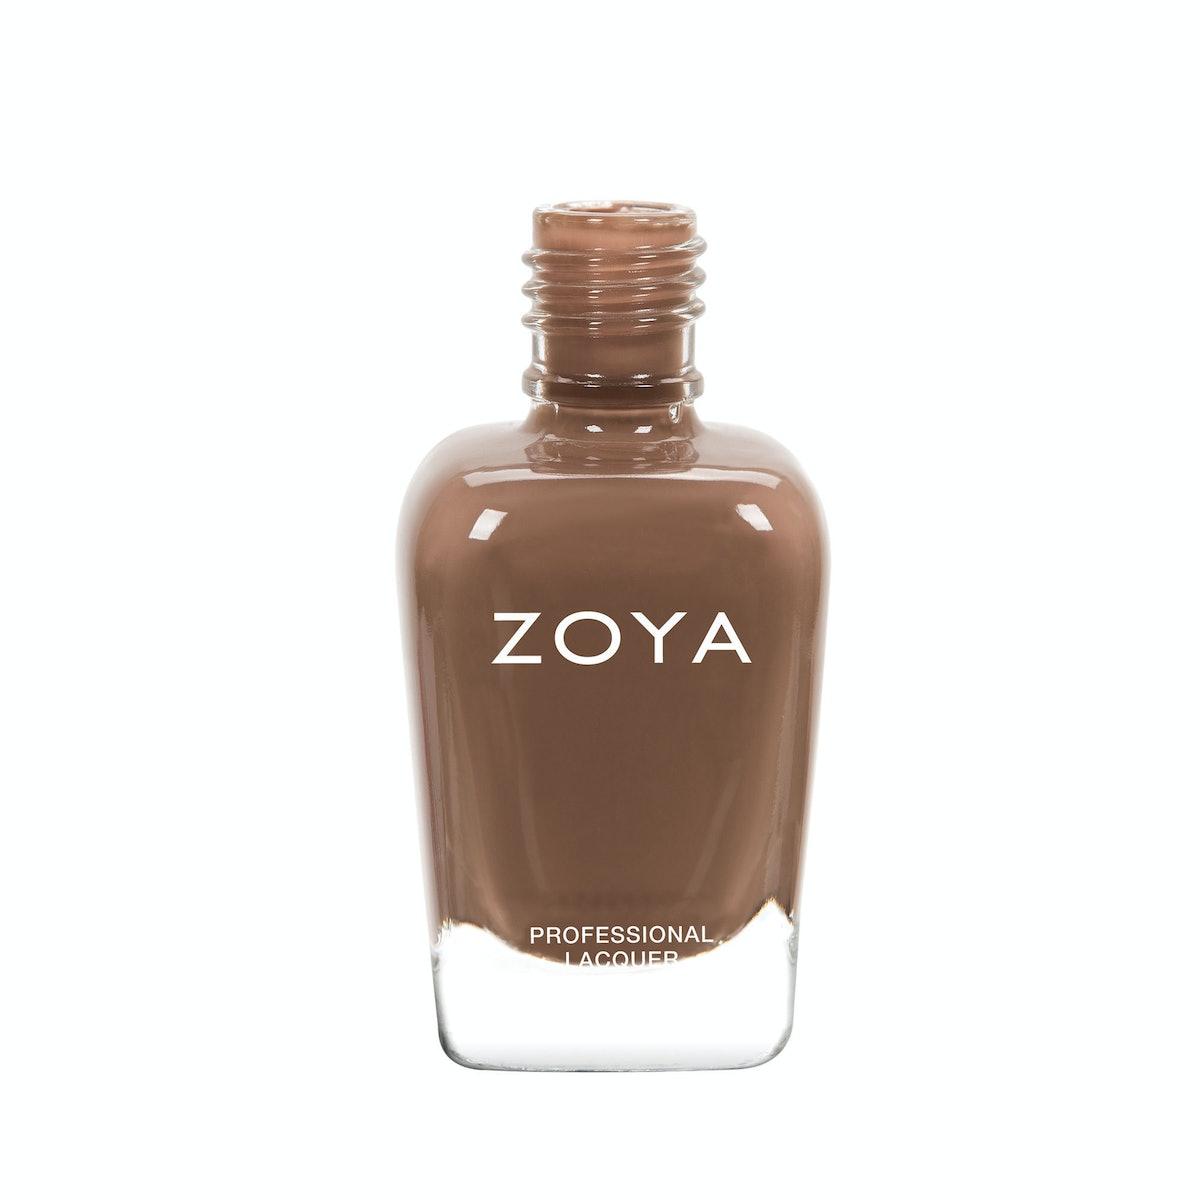 Zoya nail lacquer in Nyssa